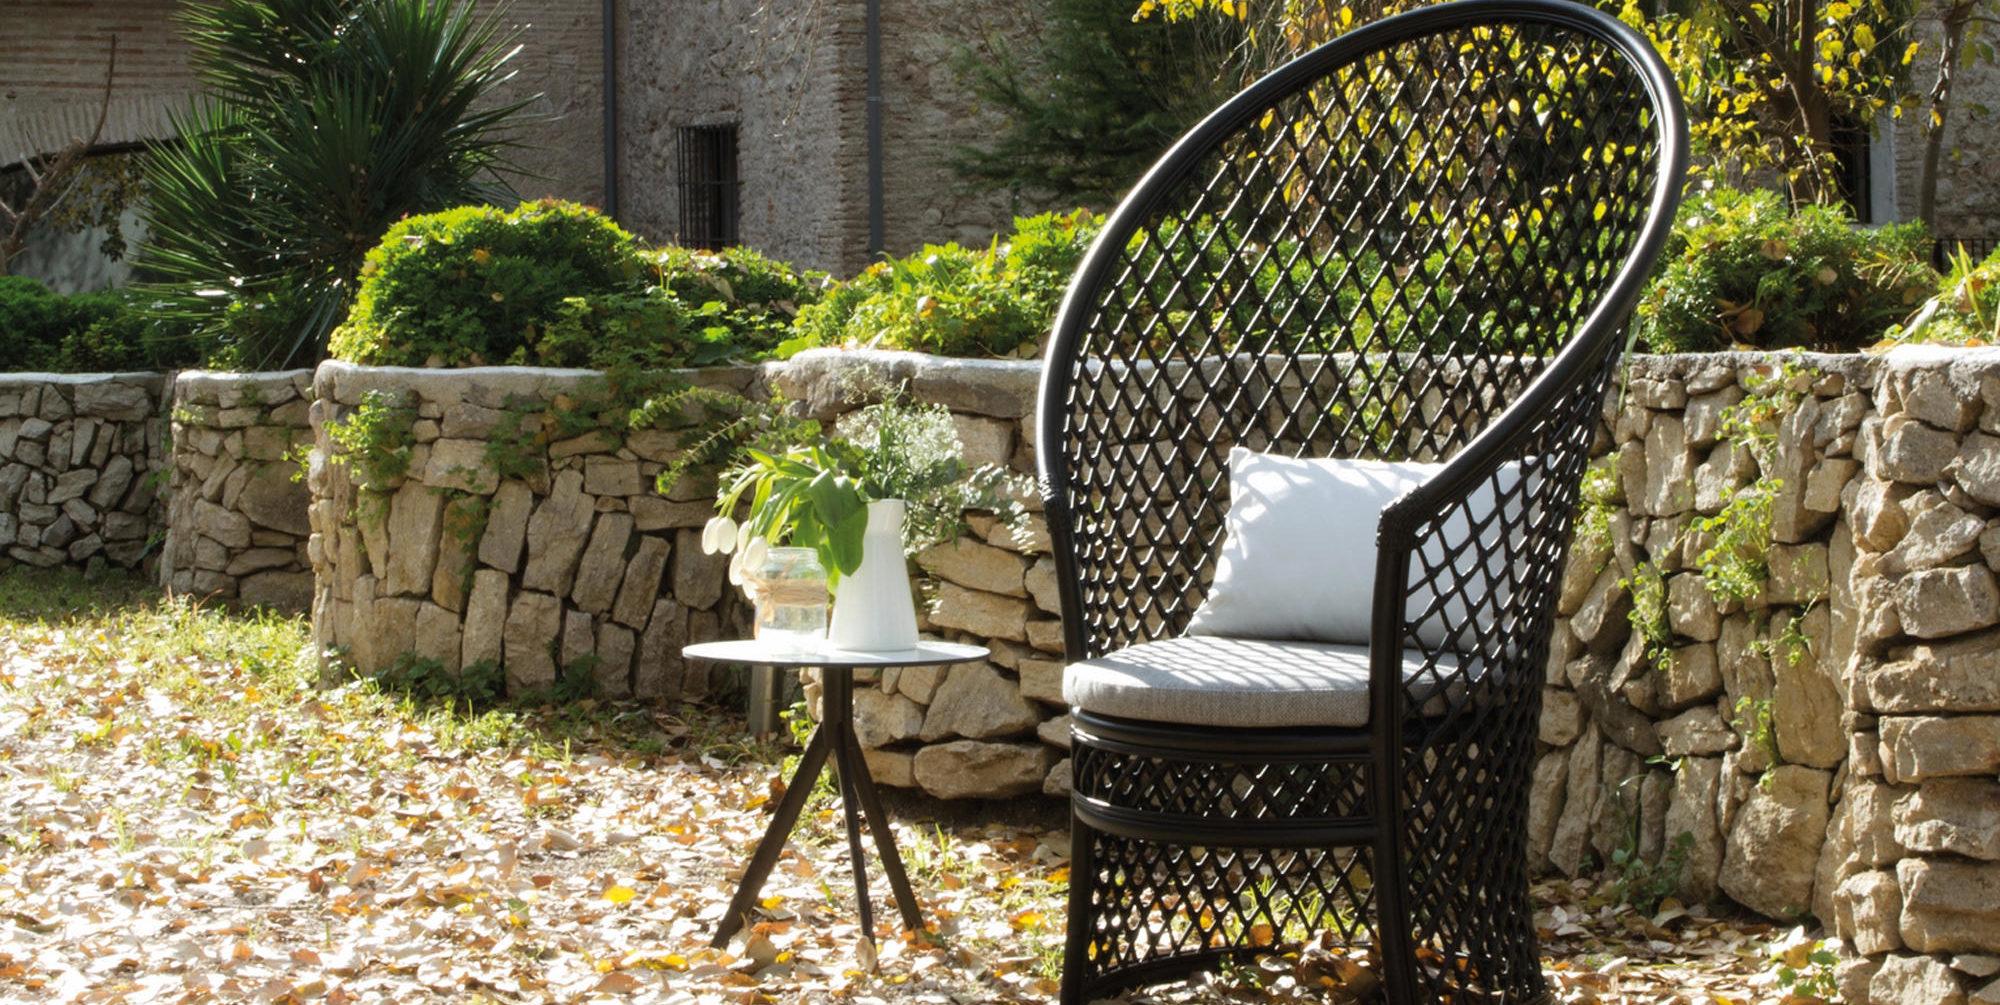 mobilier outdoor design mobilier outdoor design 12 propositions exclusives par les top. Black Bedroom Furniture Sets. Home Design Ideas